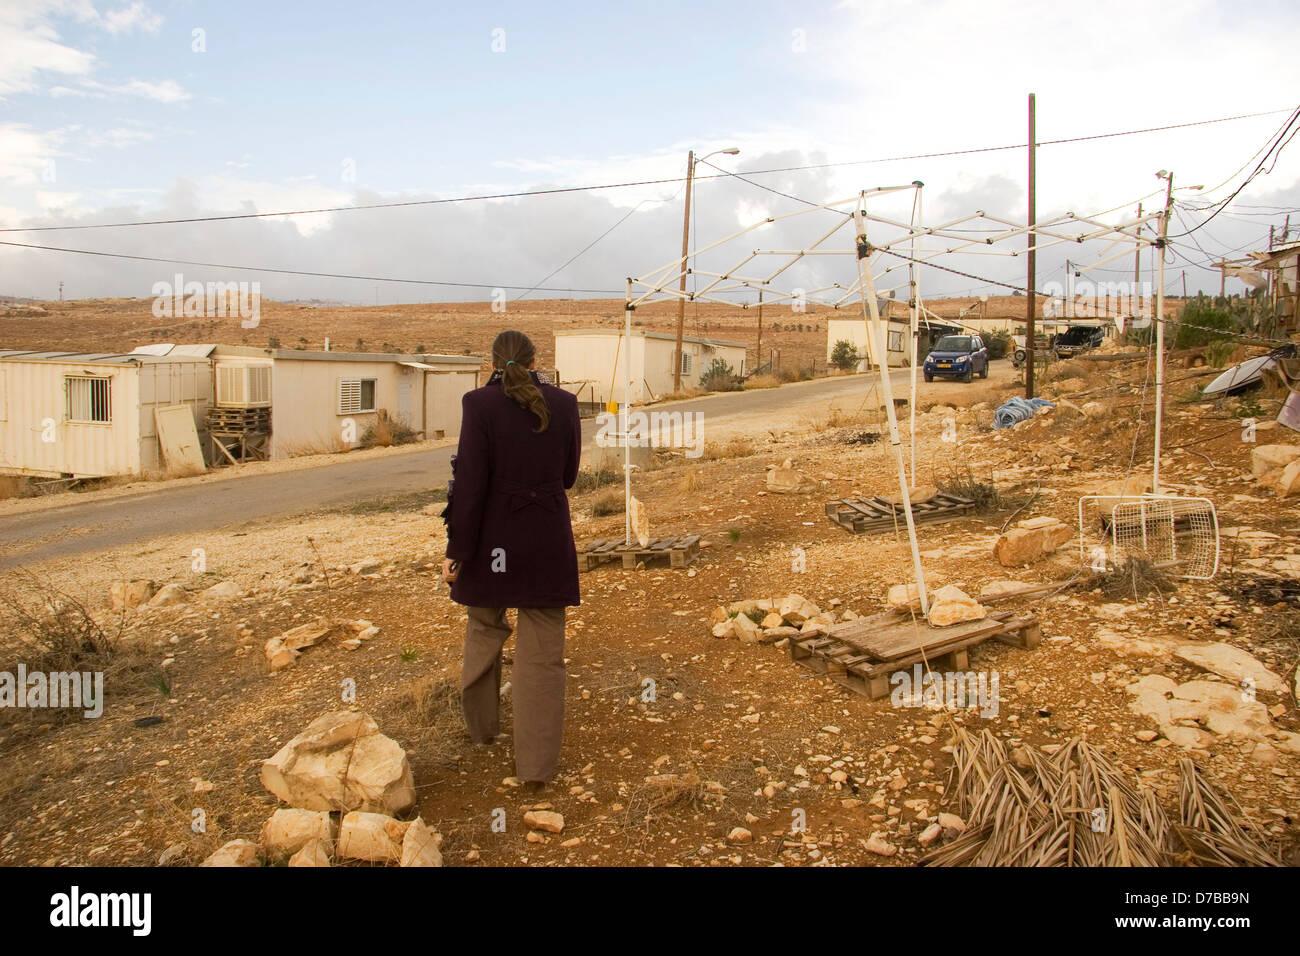 At the Settlement of Kfar Eldad - Stock Image